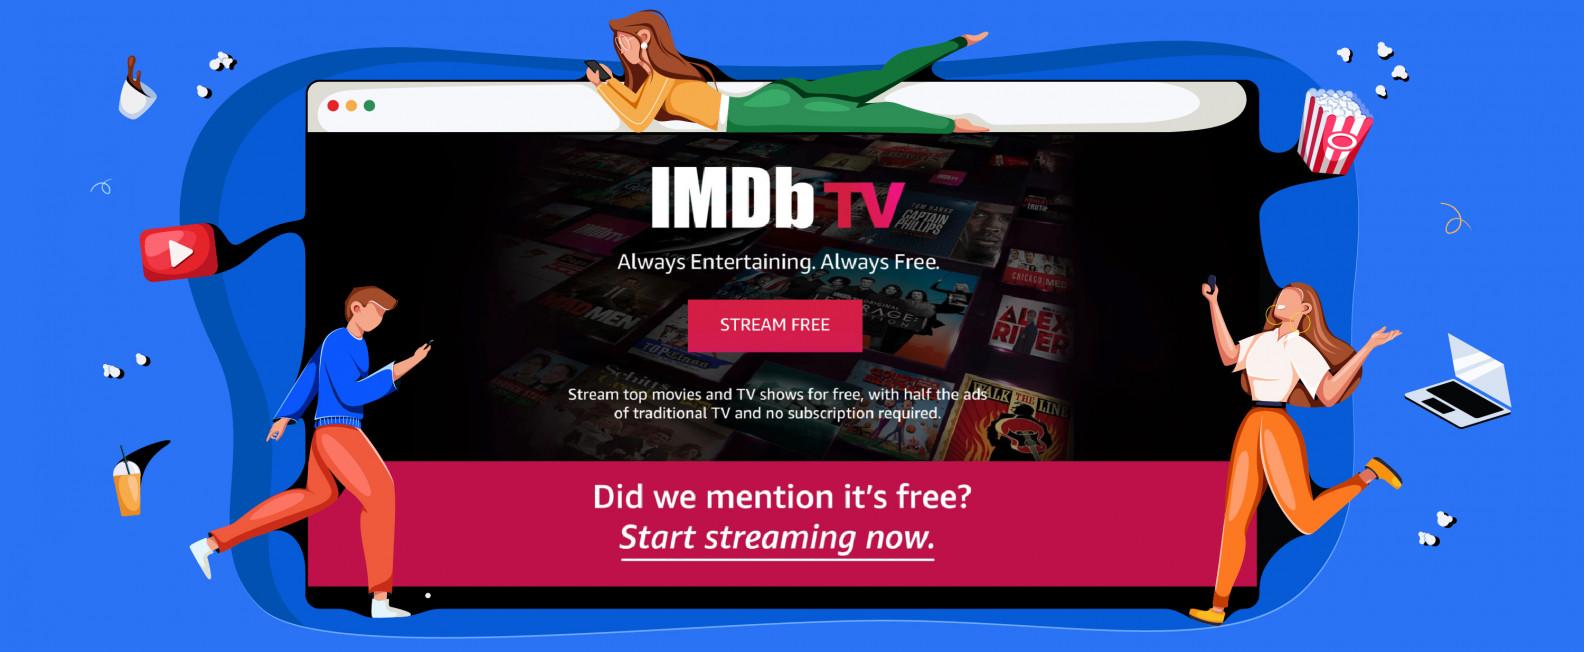 Hoe kun je IMDB TV kijken in Nederland?